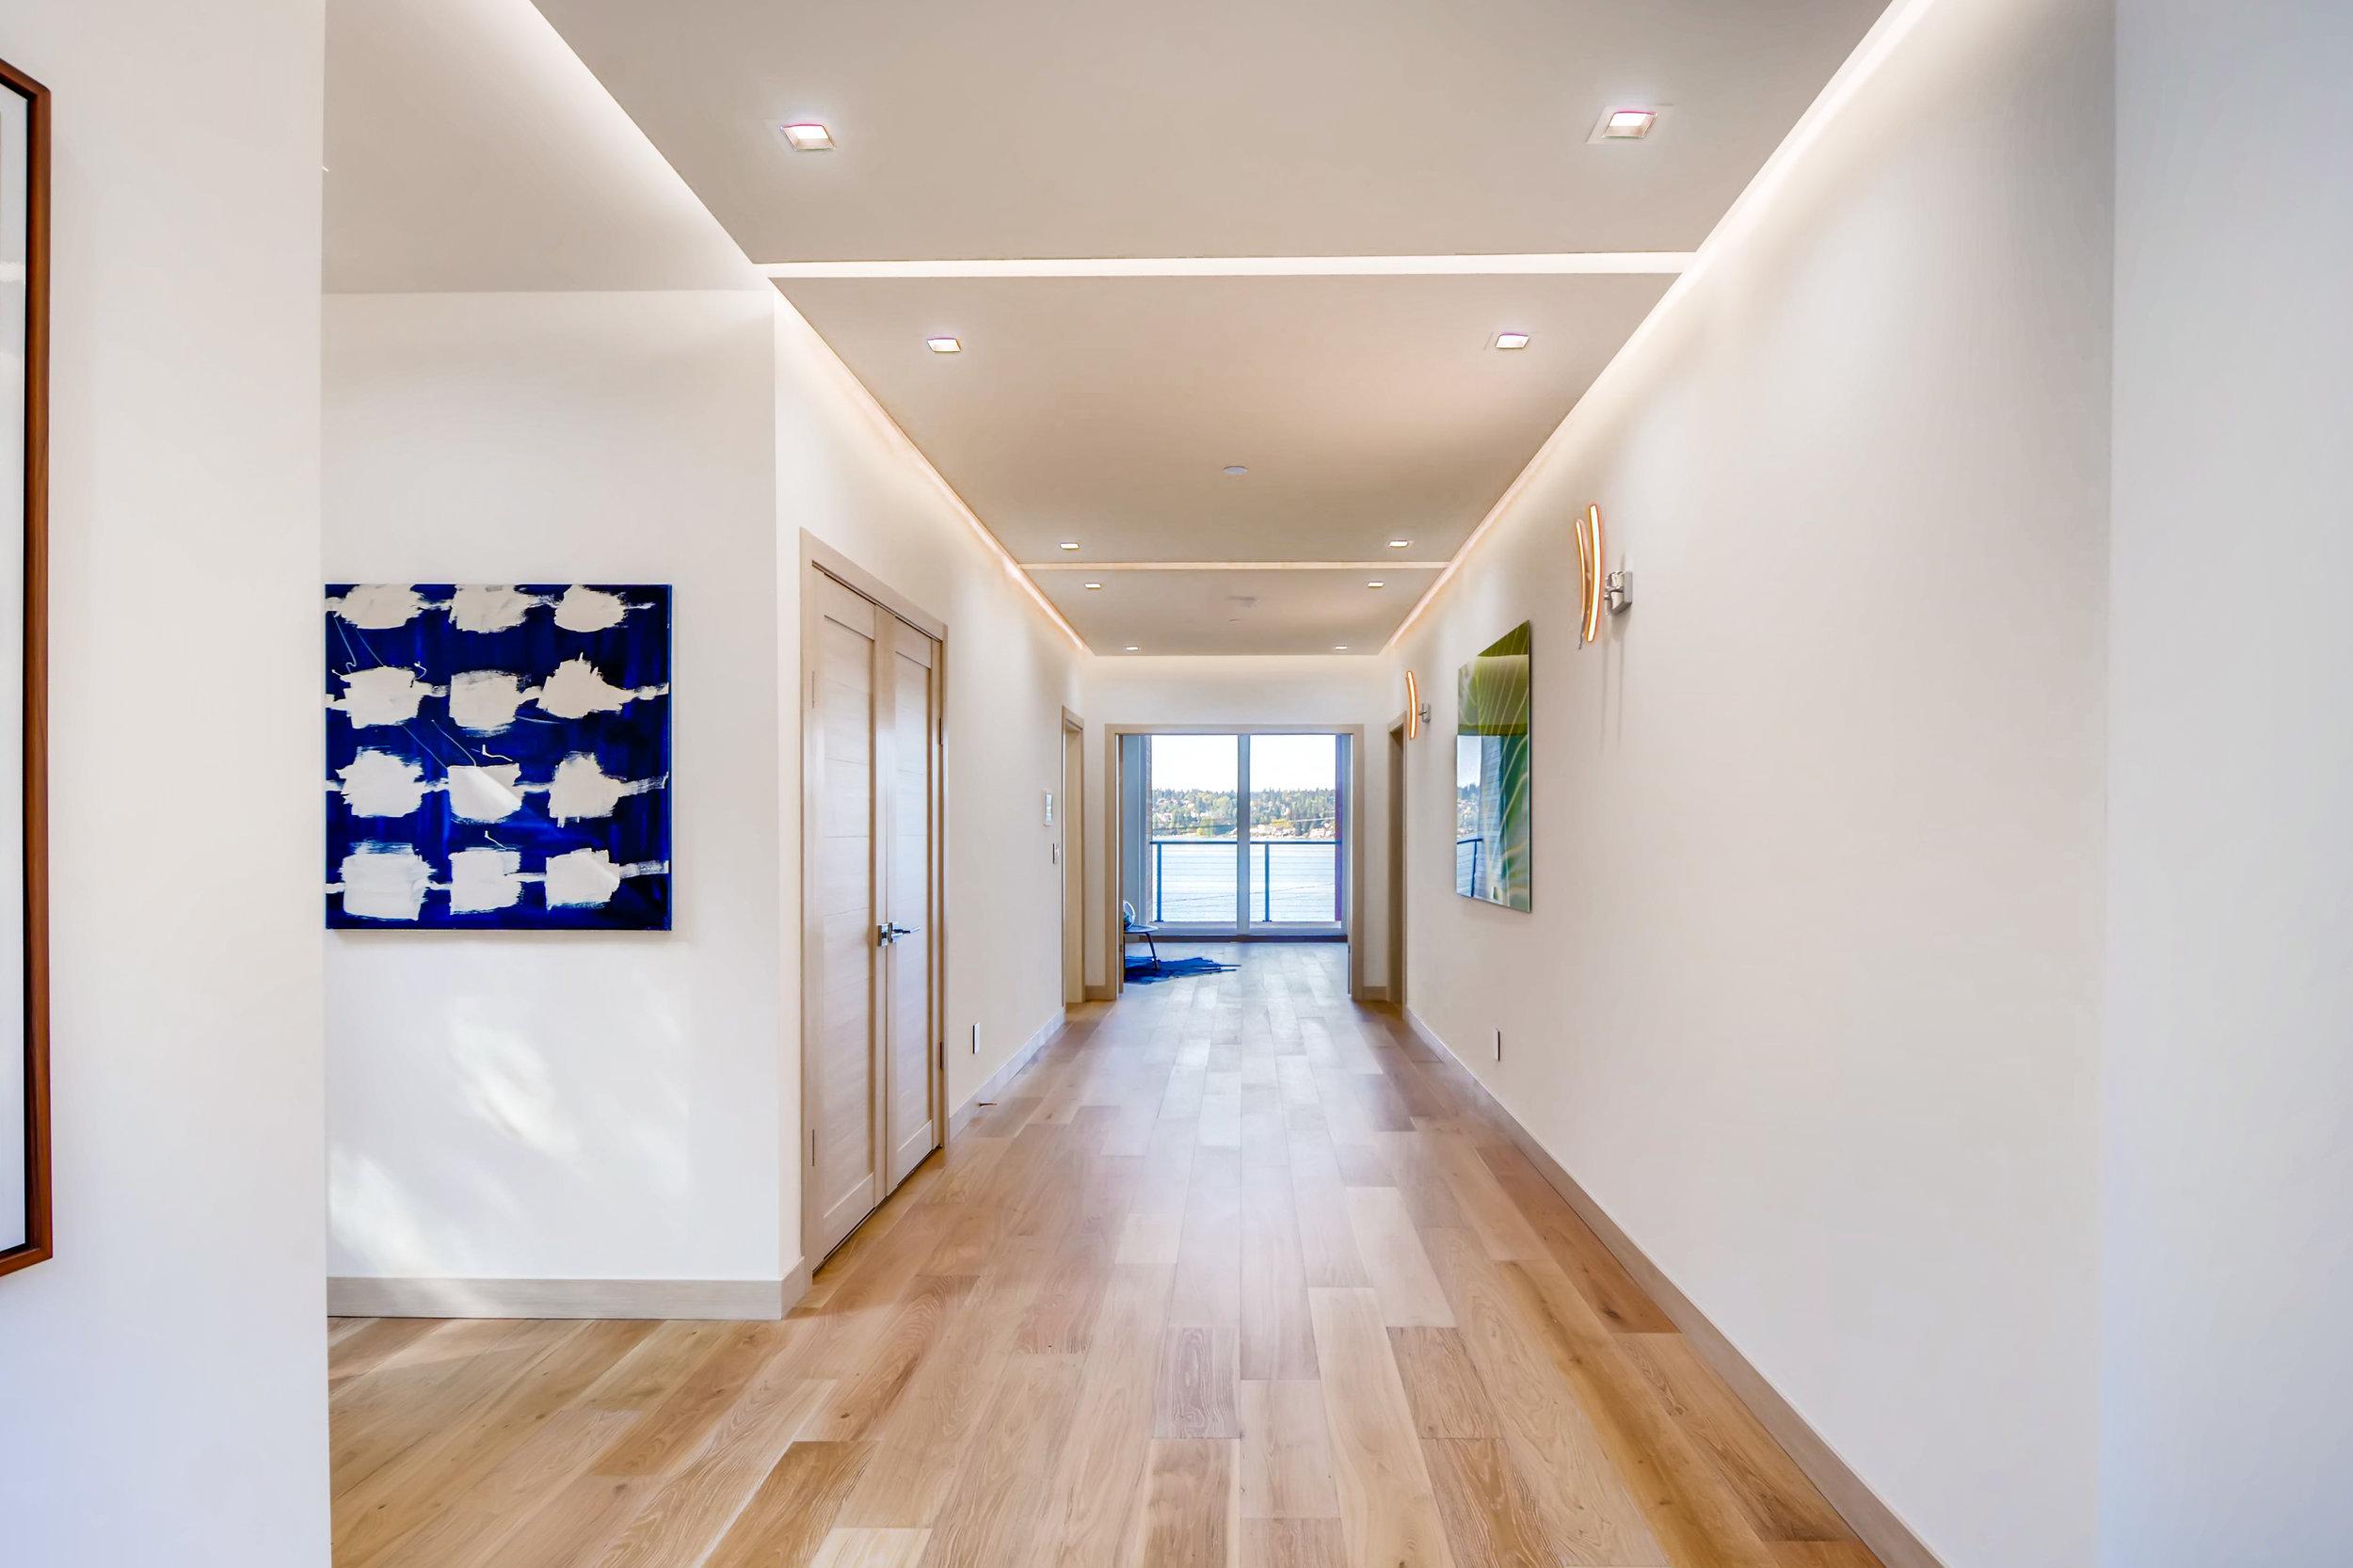 12410 Holmes Point Drive NE-print-031-13-2nd Floor Hallway-4200x2800-300dpi.jpg